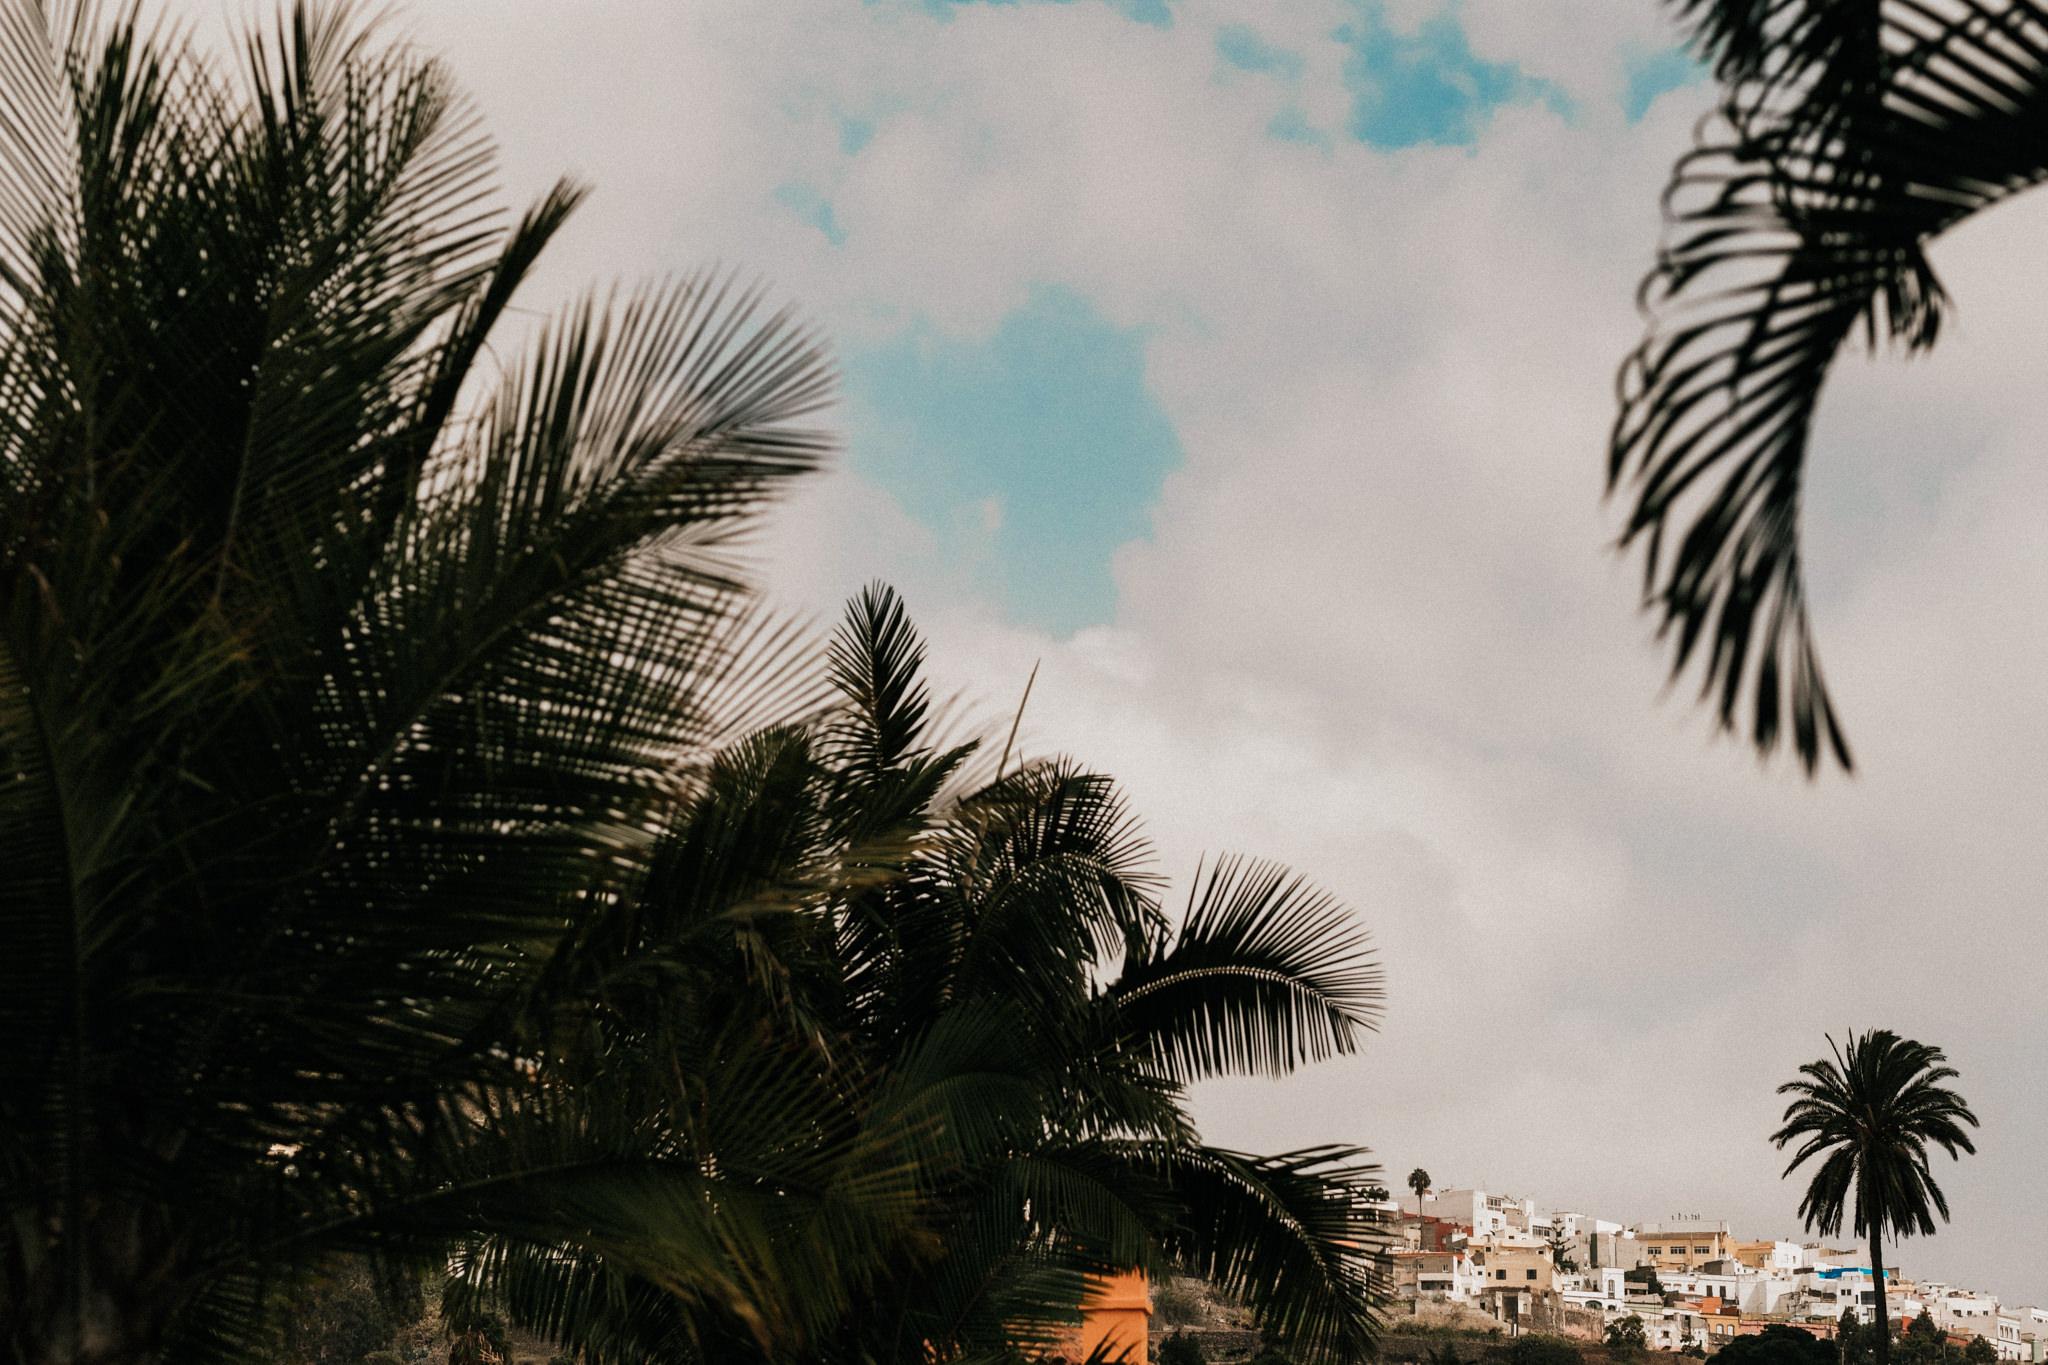 Fot grafo boda la hacienda del buen suceso las palmas - Fotografo las palmas ...